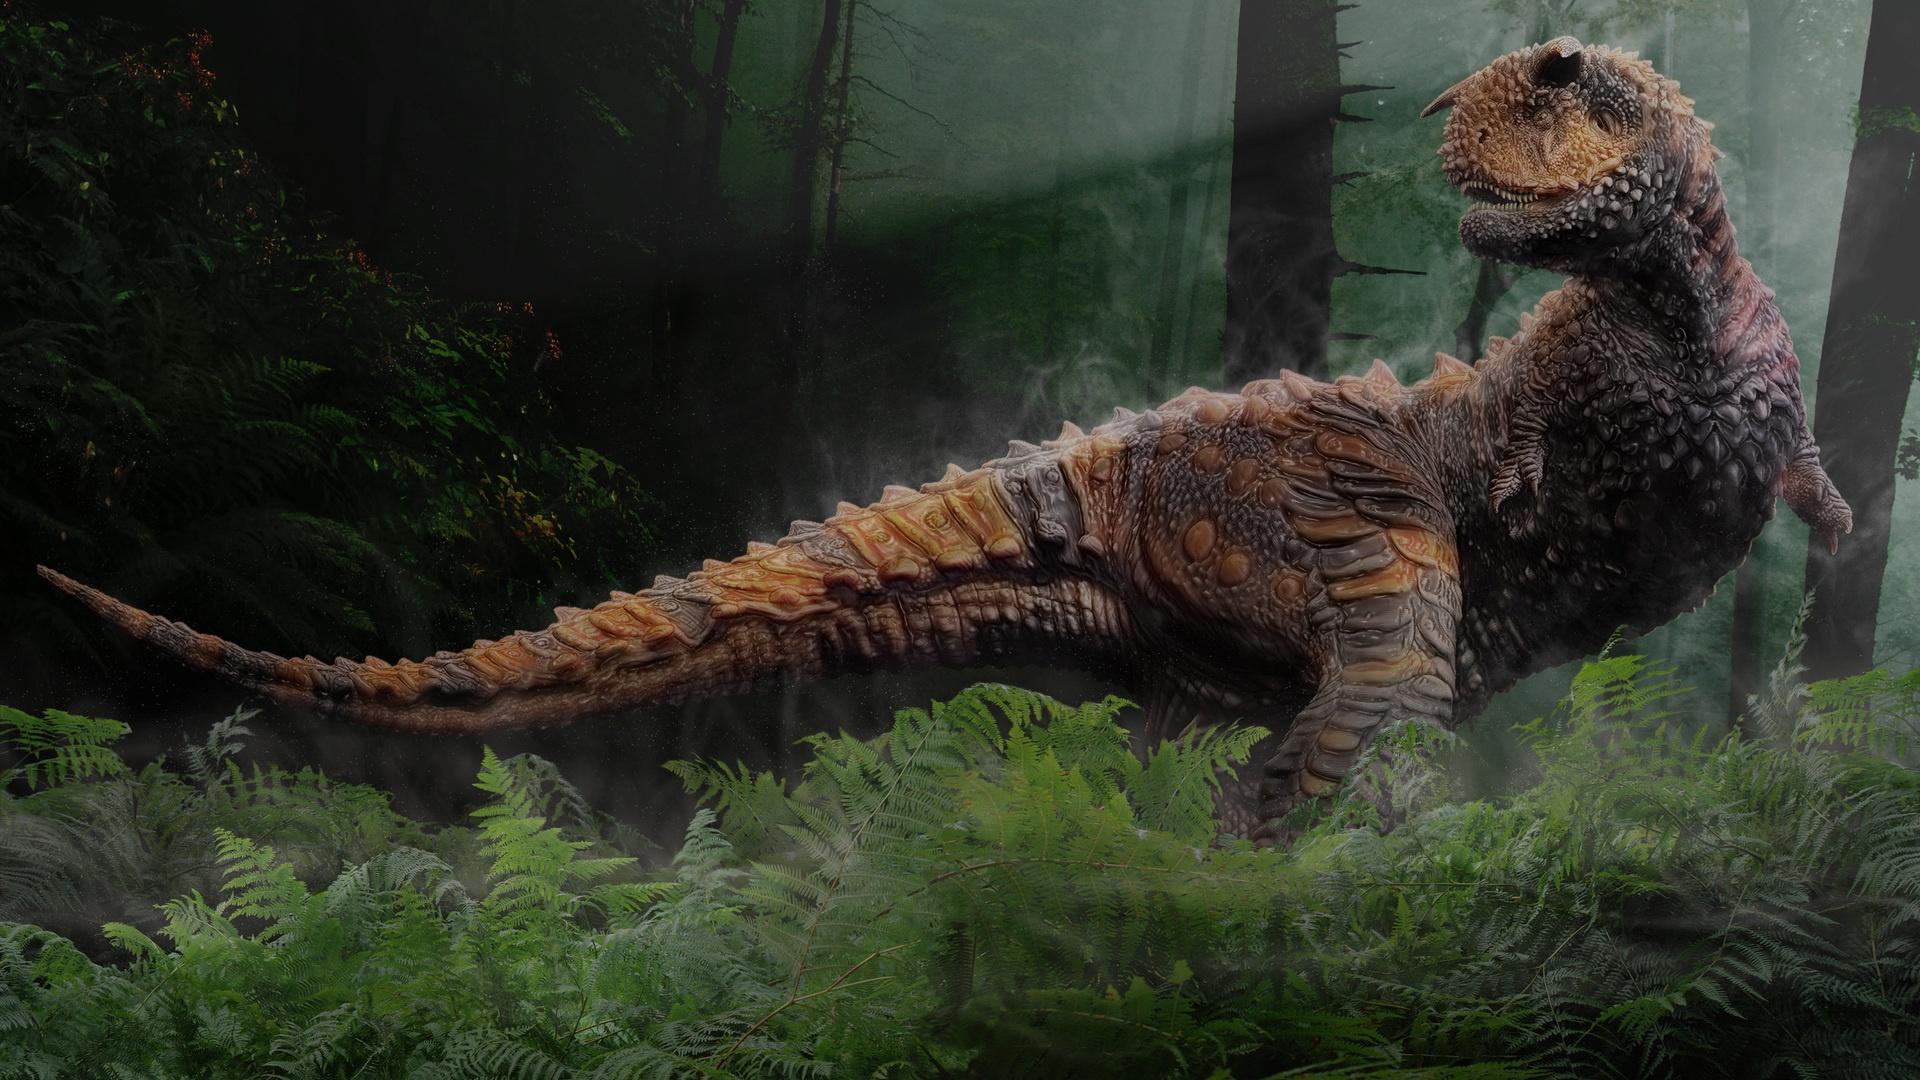 animal dinosaur backgrounds wallpapersjpg 1920x1080